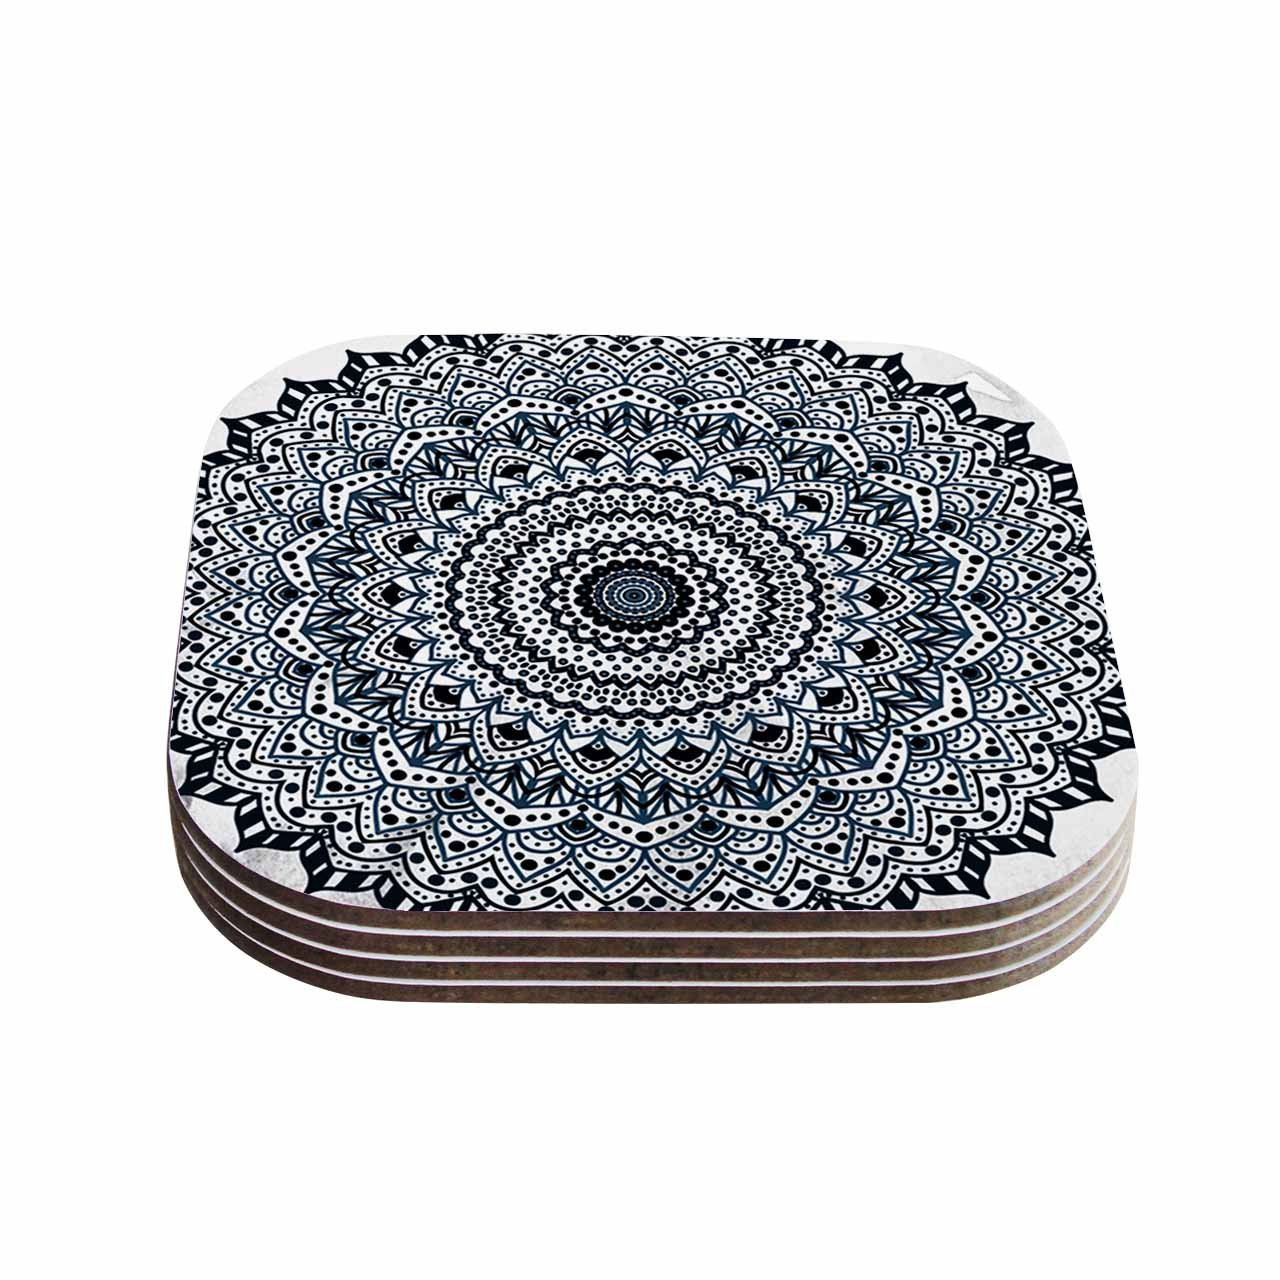 4 x 4 Multi Set of 4 KESS InHouse Nika MartinezBoheme Dream Mandala Black Blue Illustration Coasters